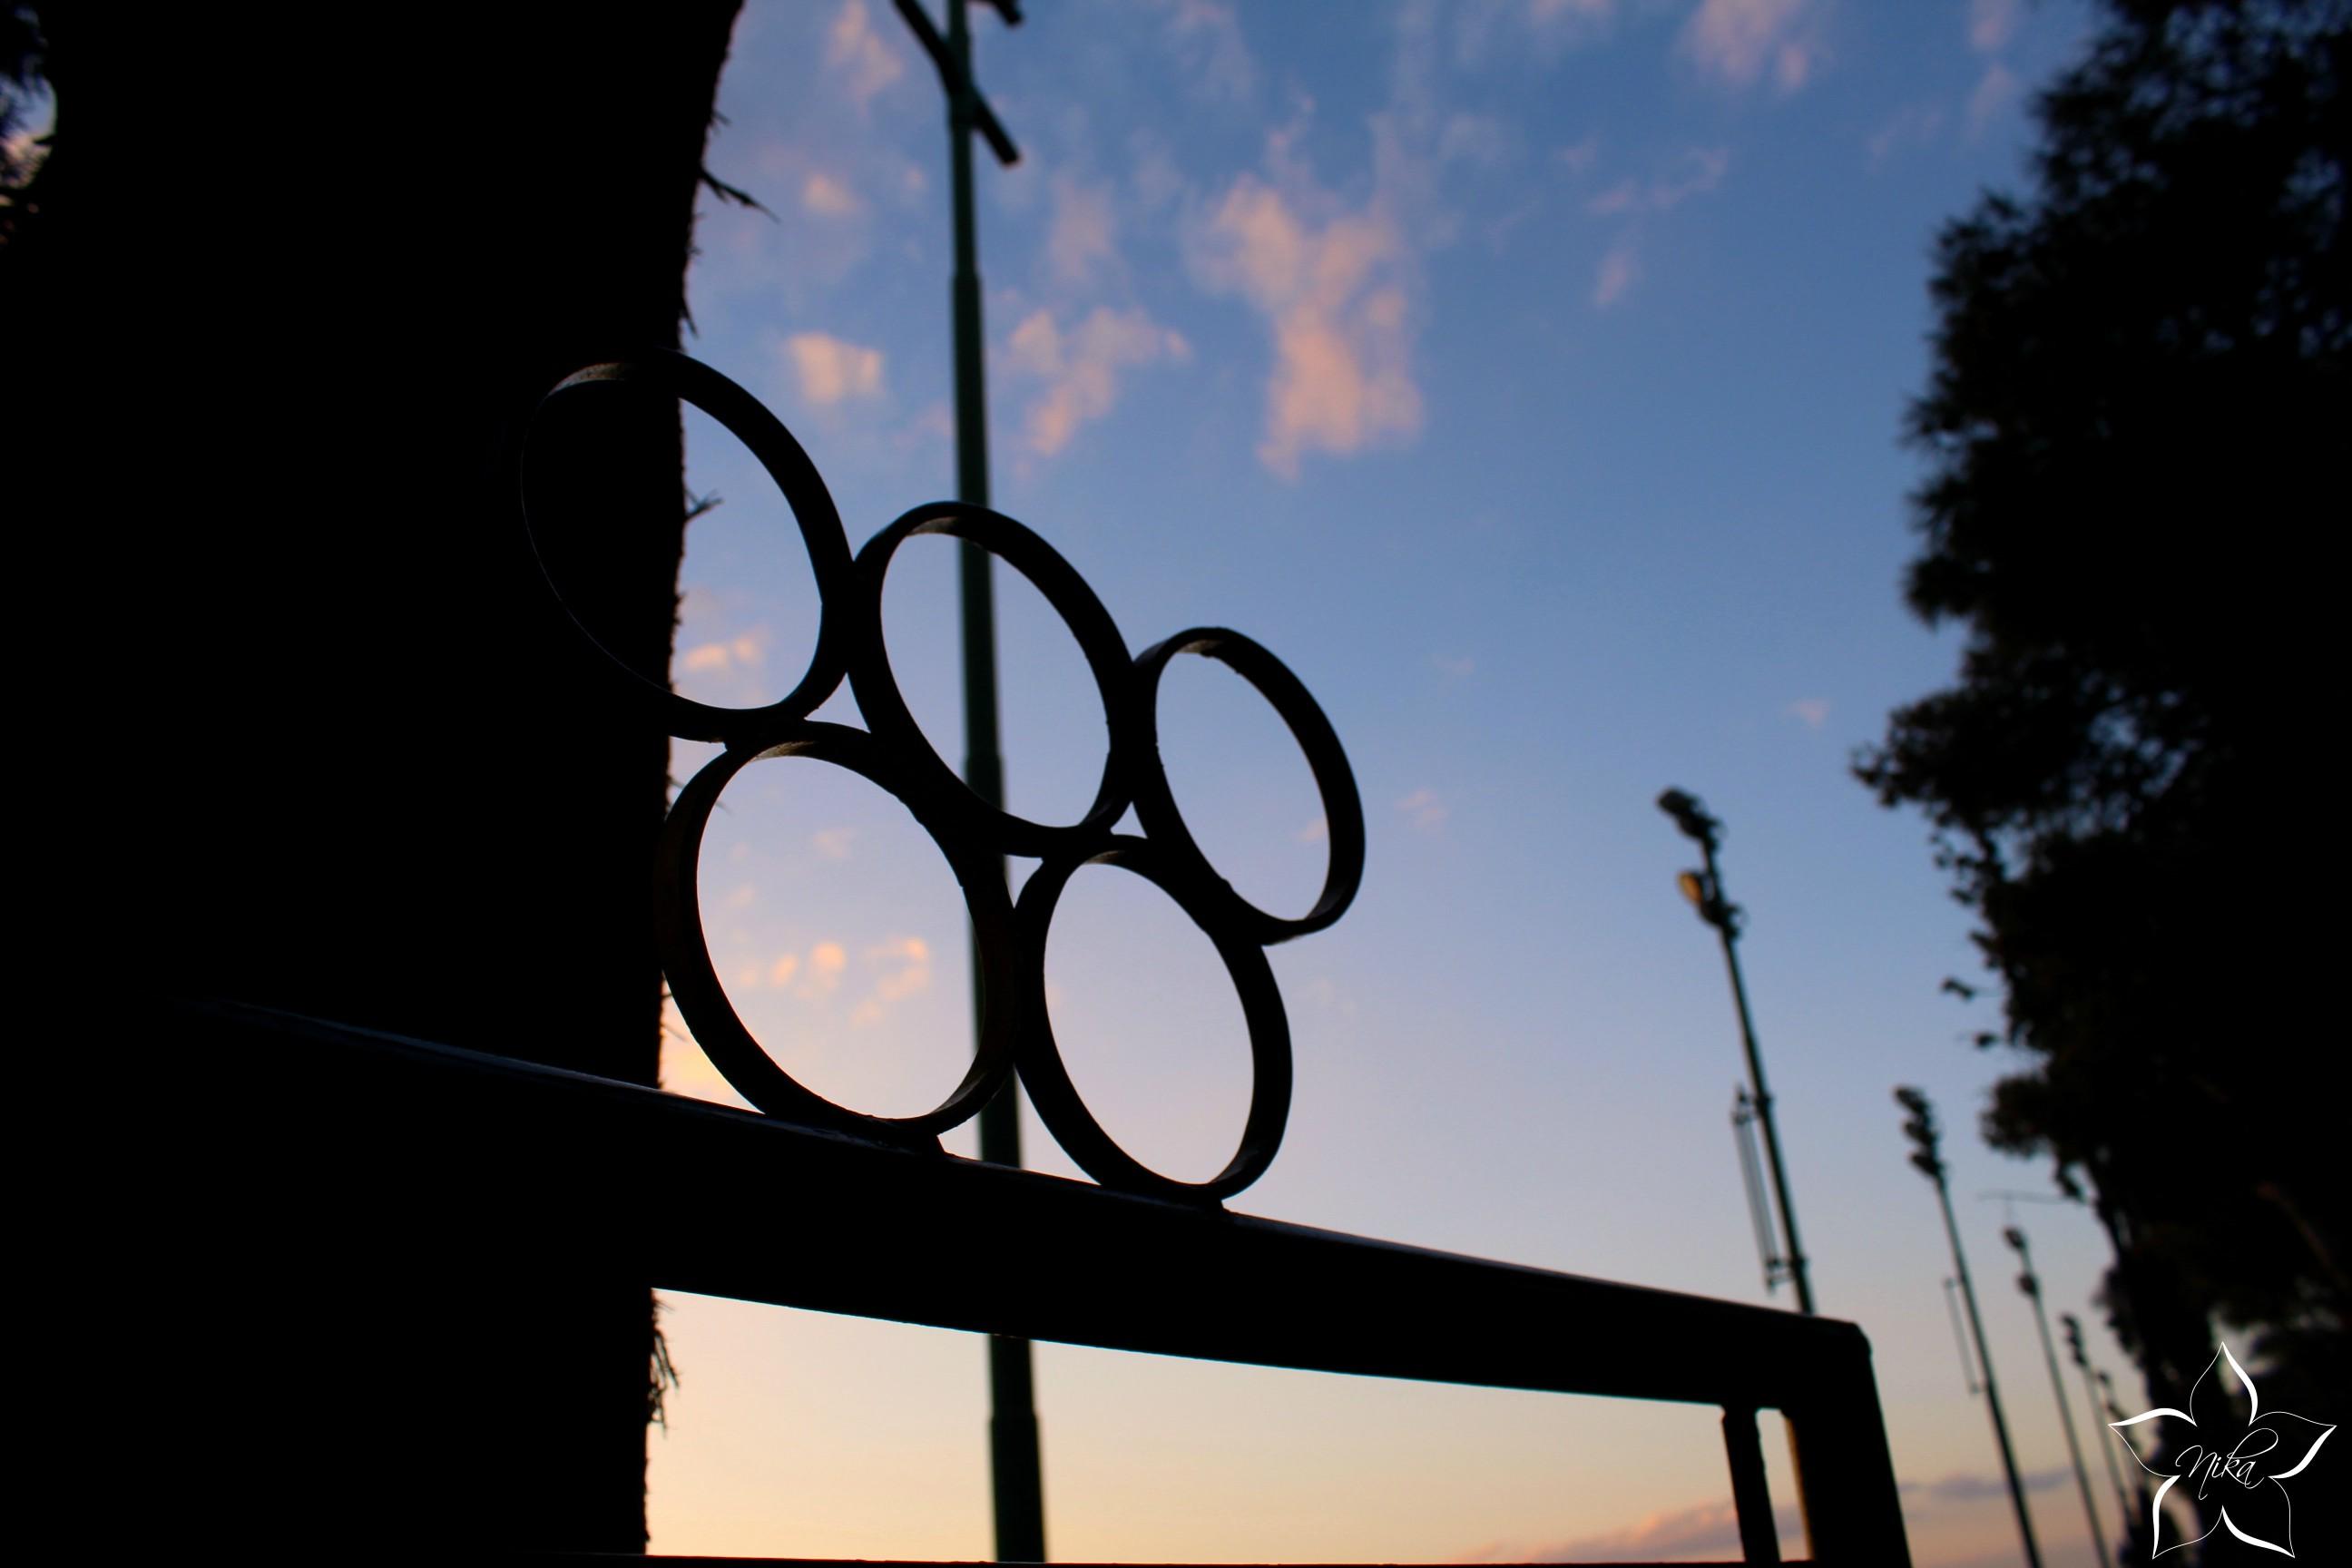 olympijsky stadion ateny grecko